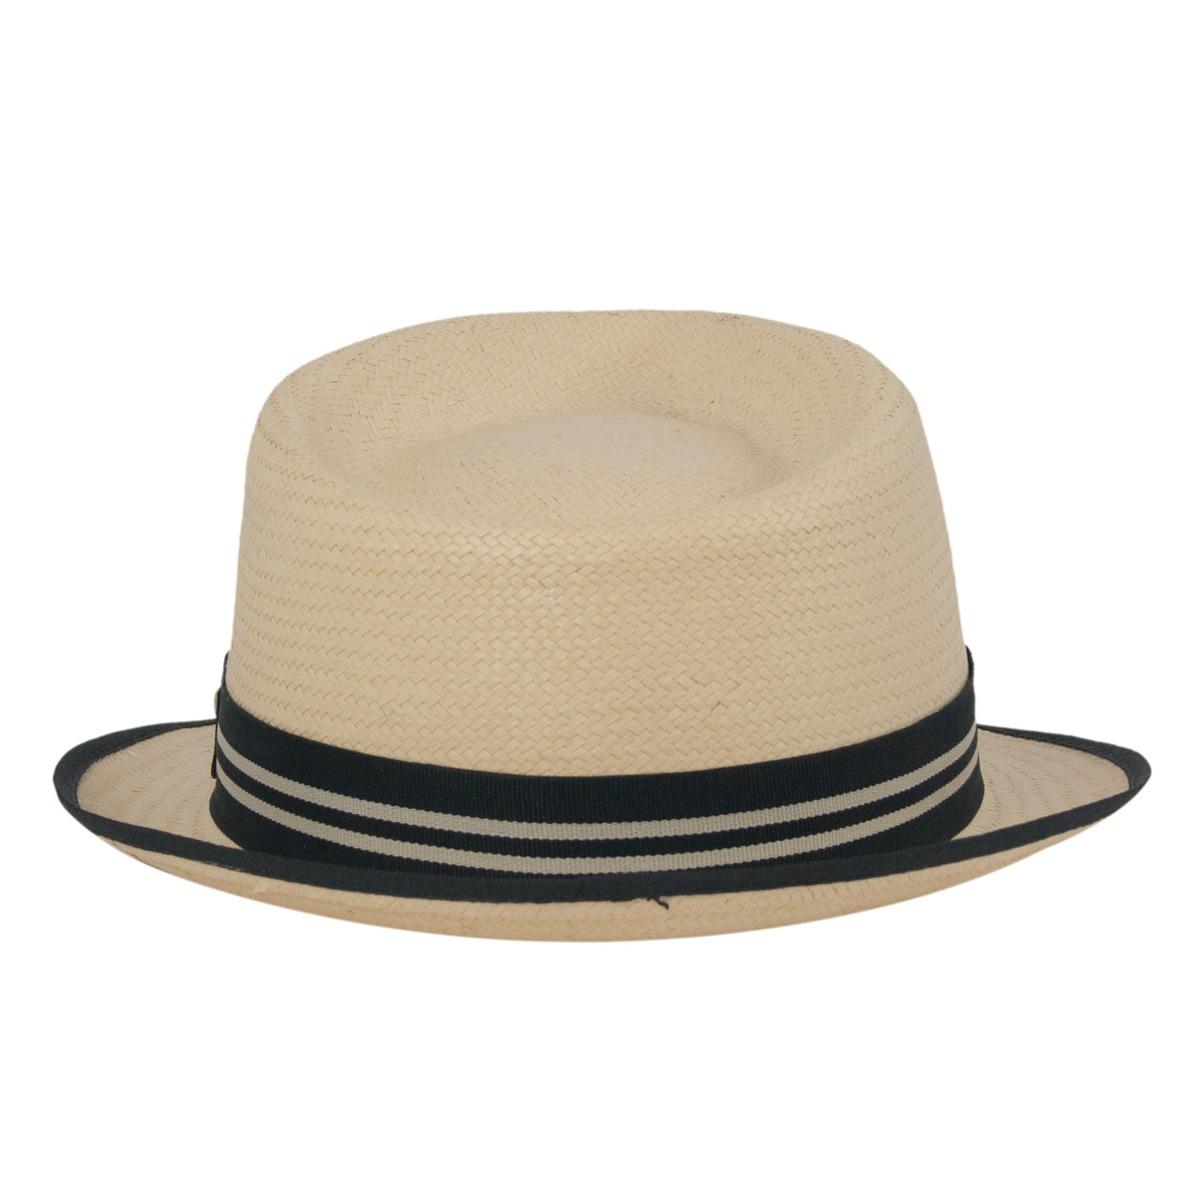 chapéu trilby unissex estilo palha aba curta todos os tamanh. Carregando  zoom. ef218c7c754